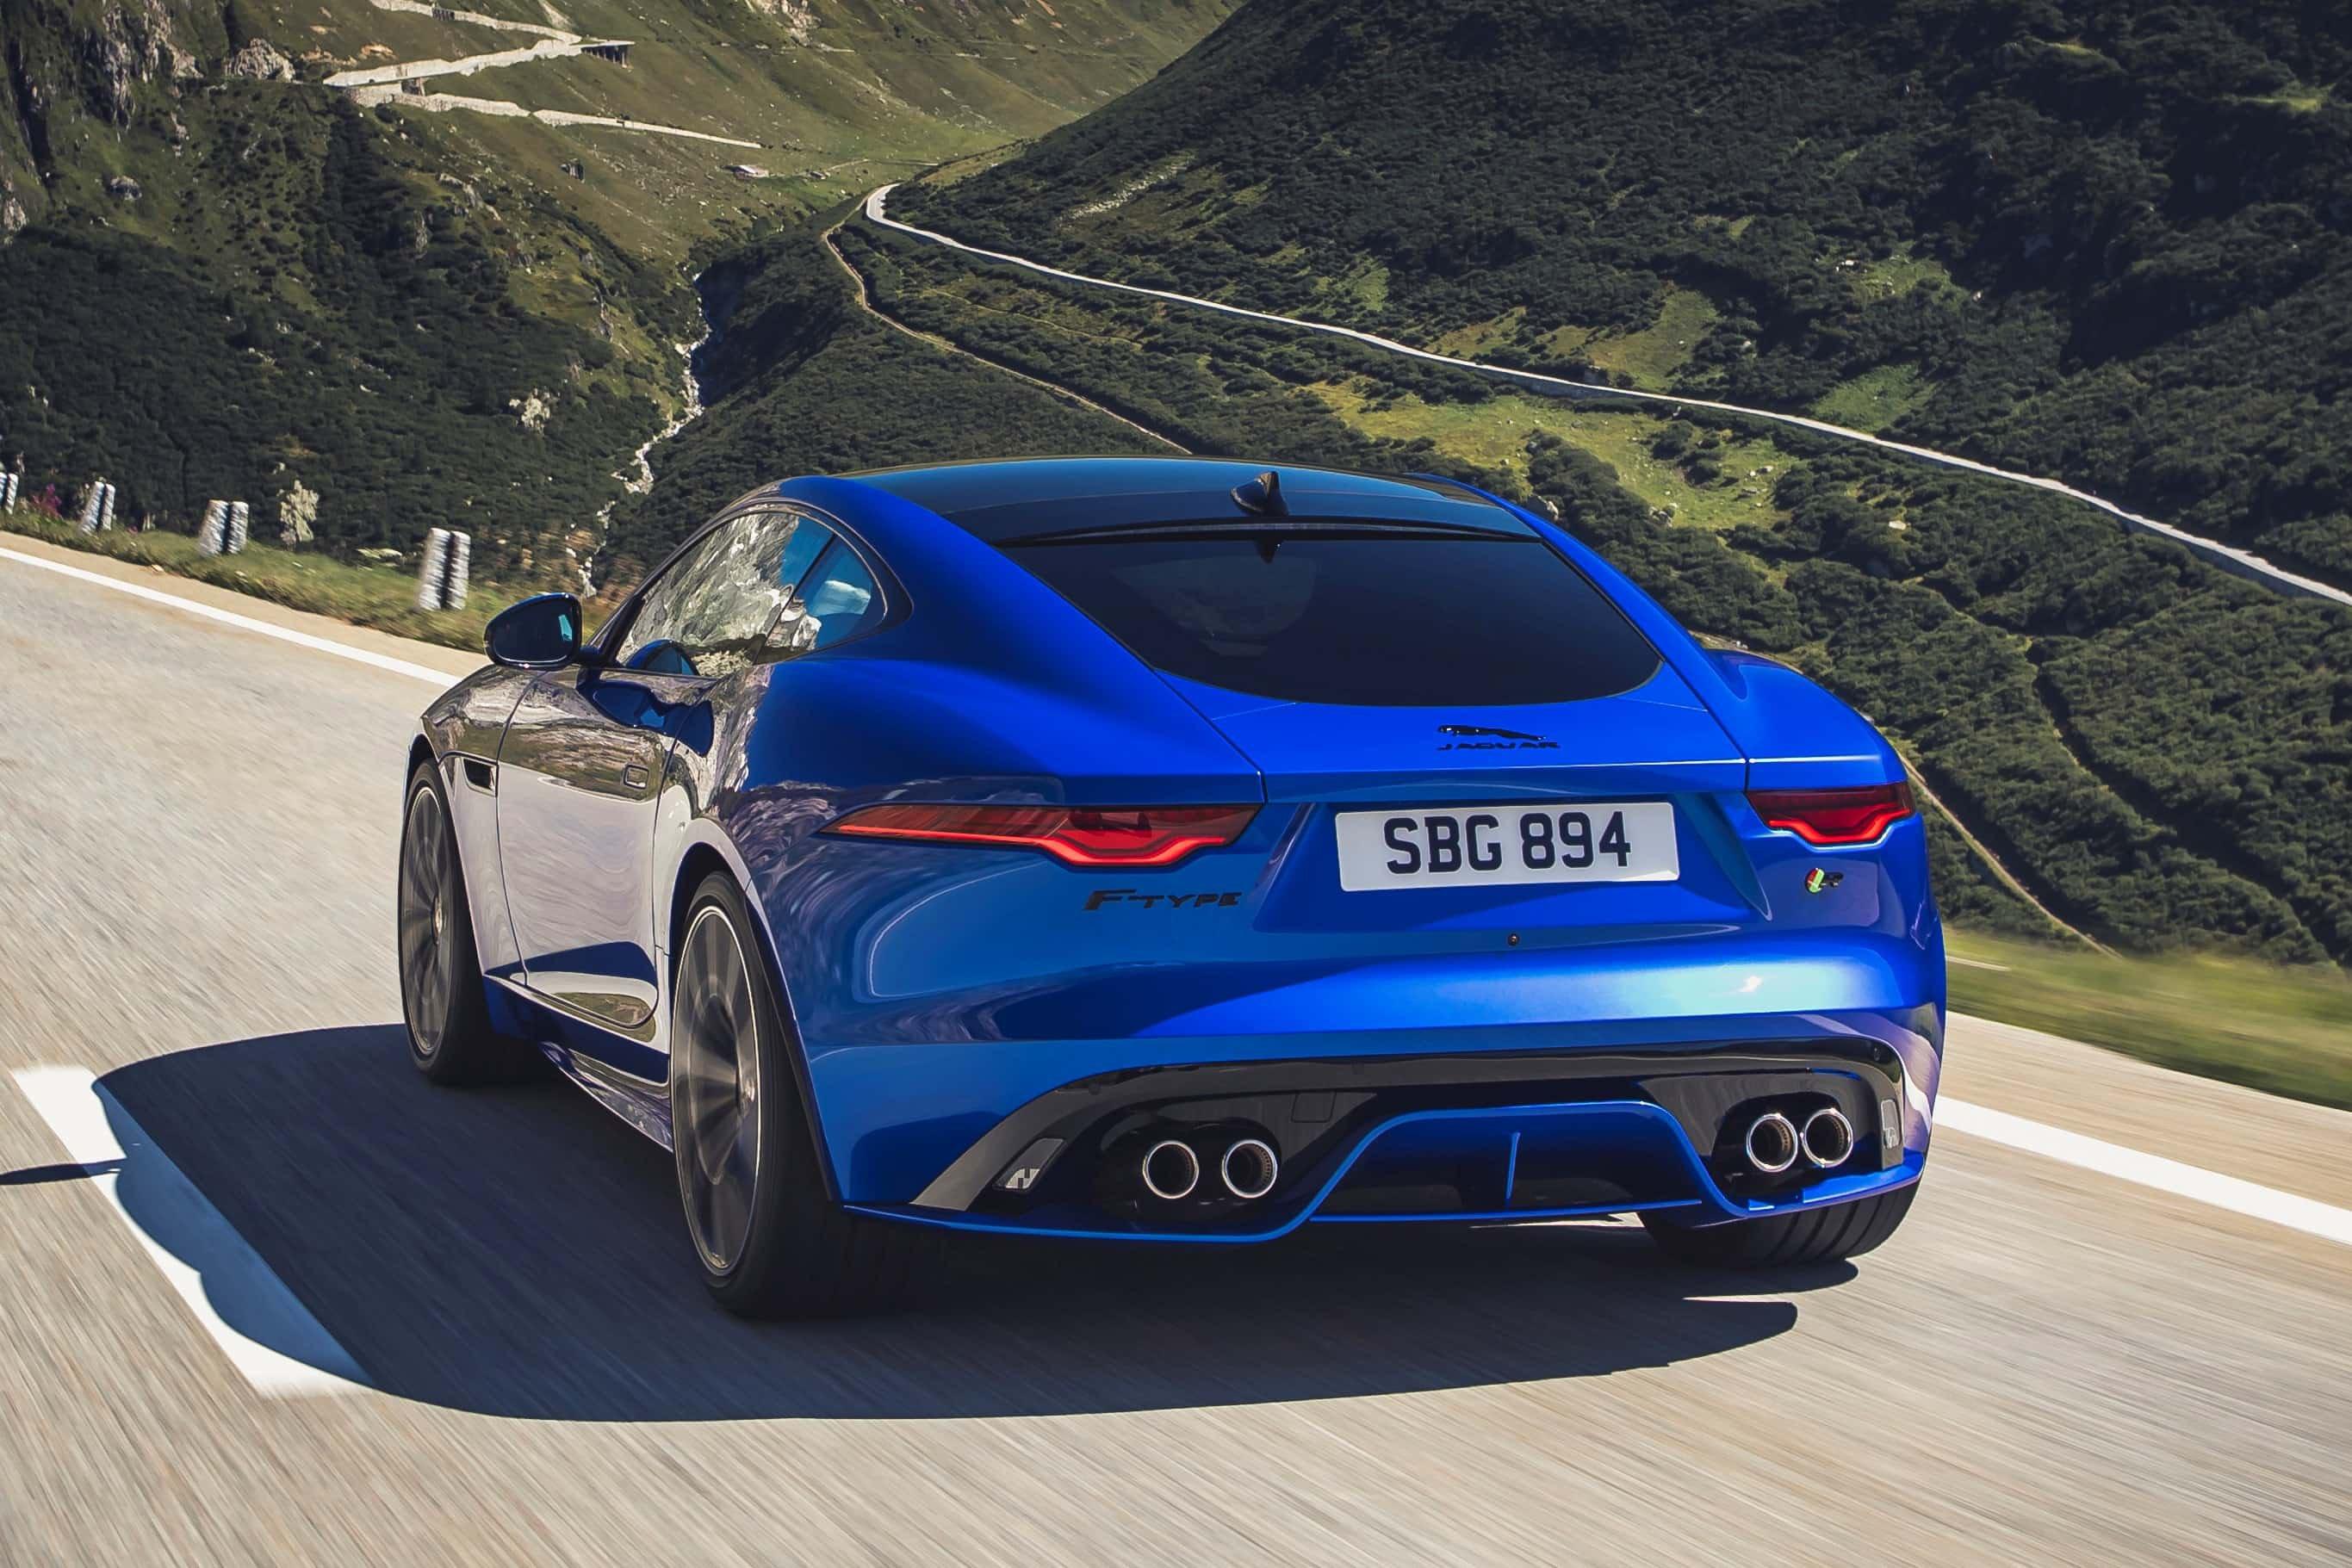 2020 Jaguar F-Type Rear